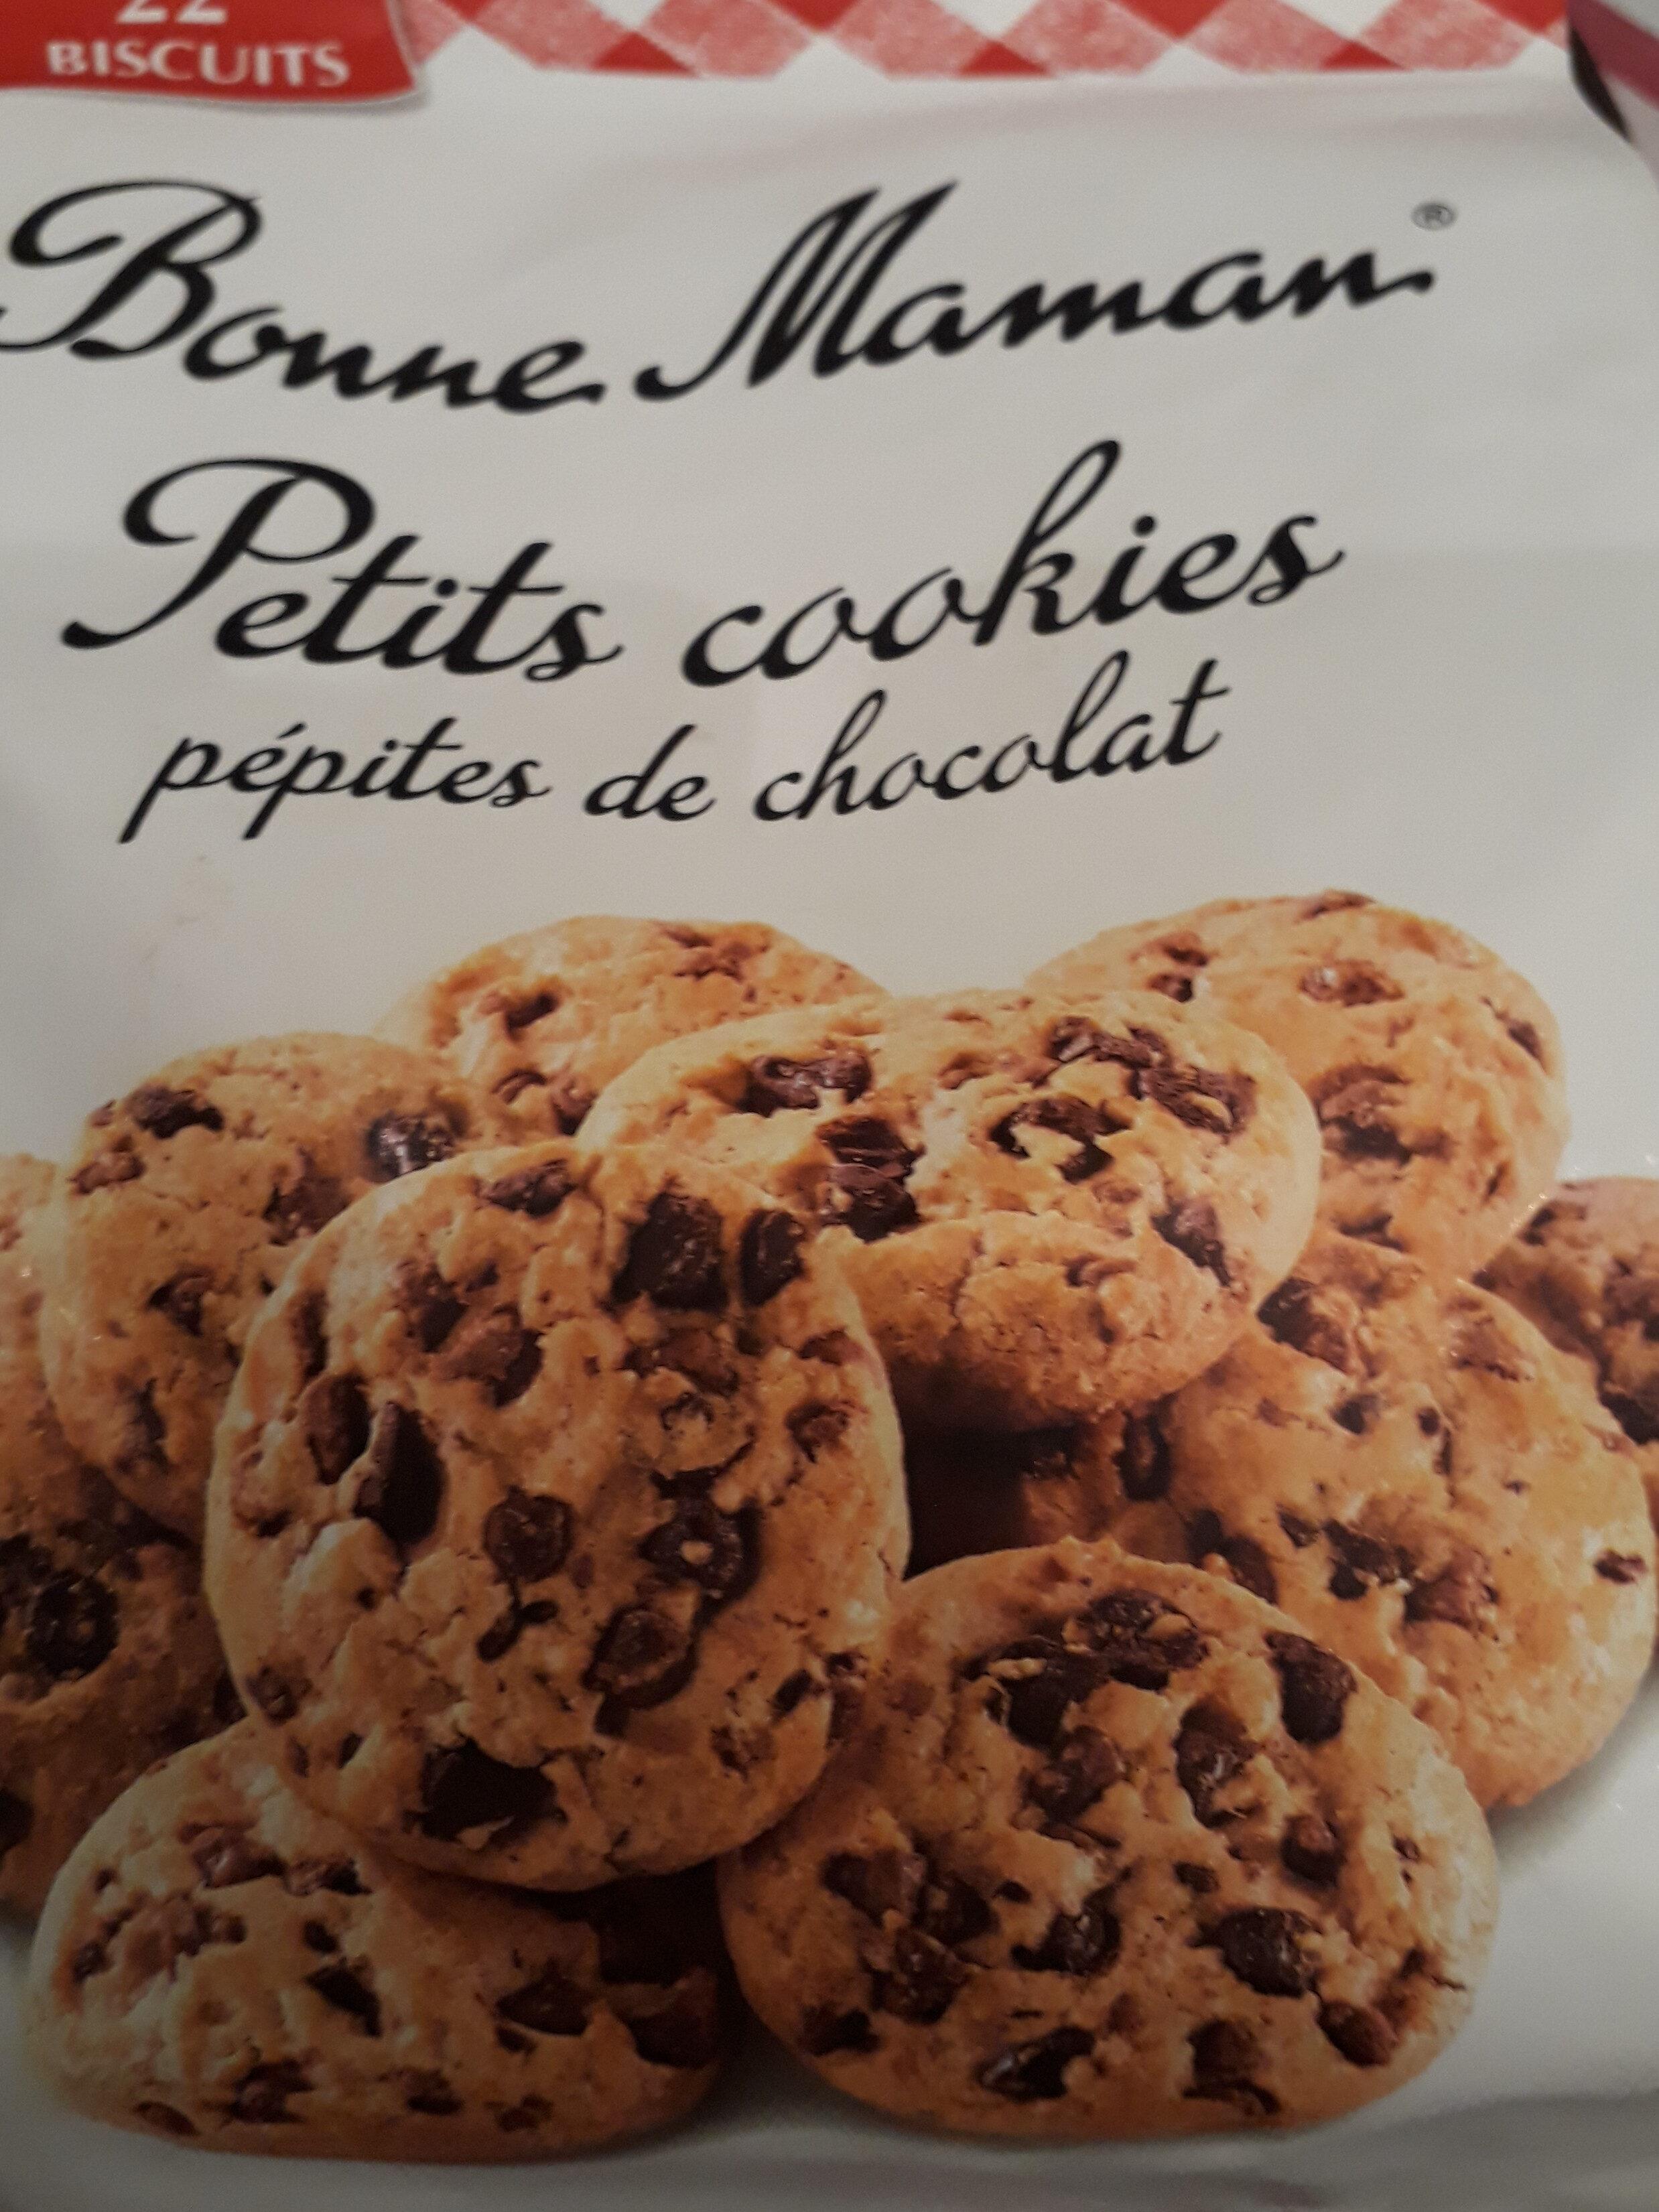 petits cookies pépites de chocolat - Product - fr